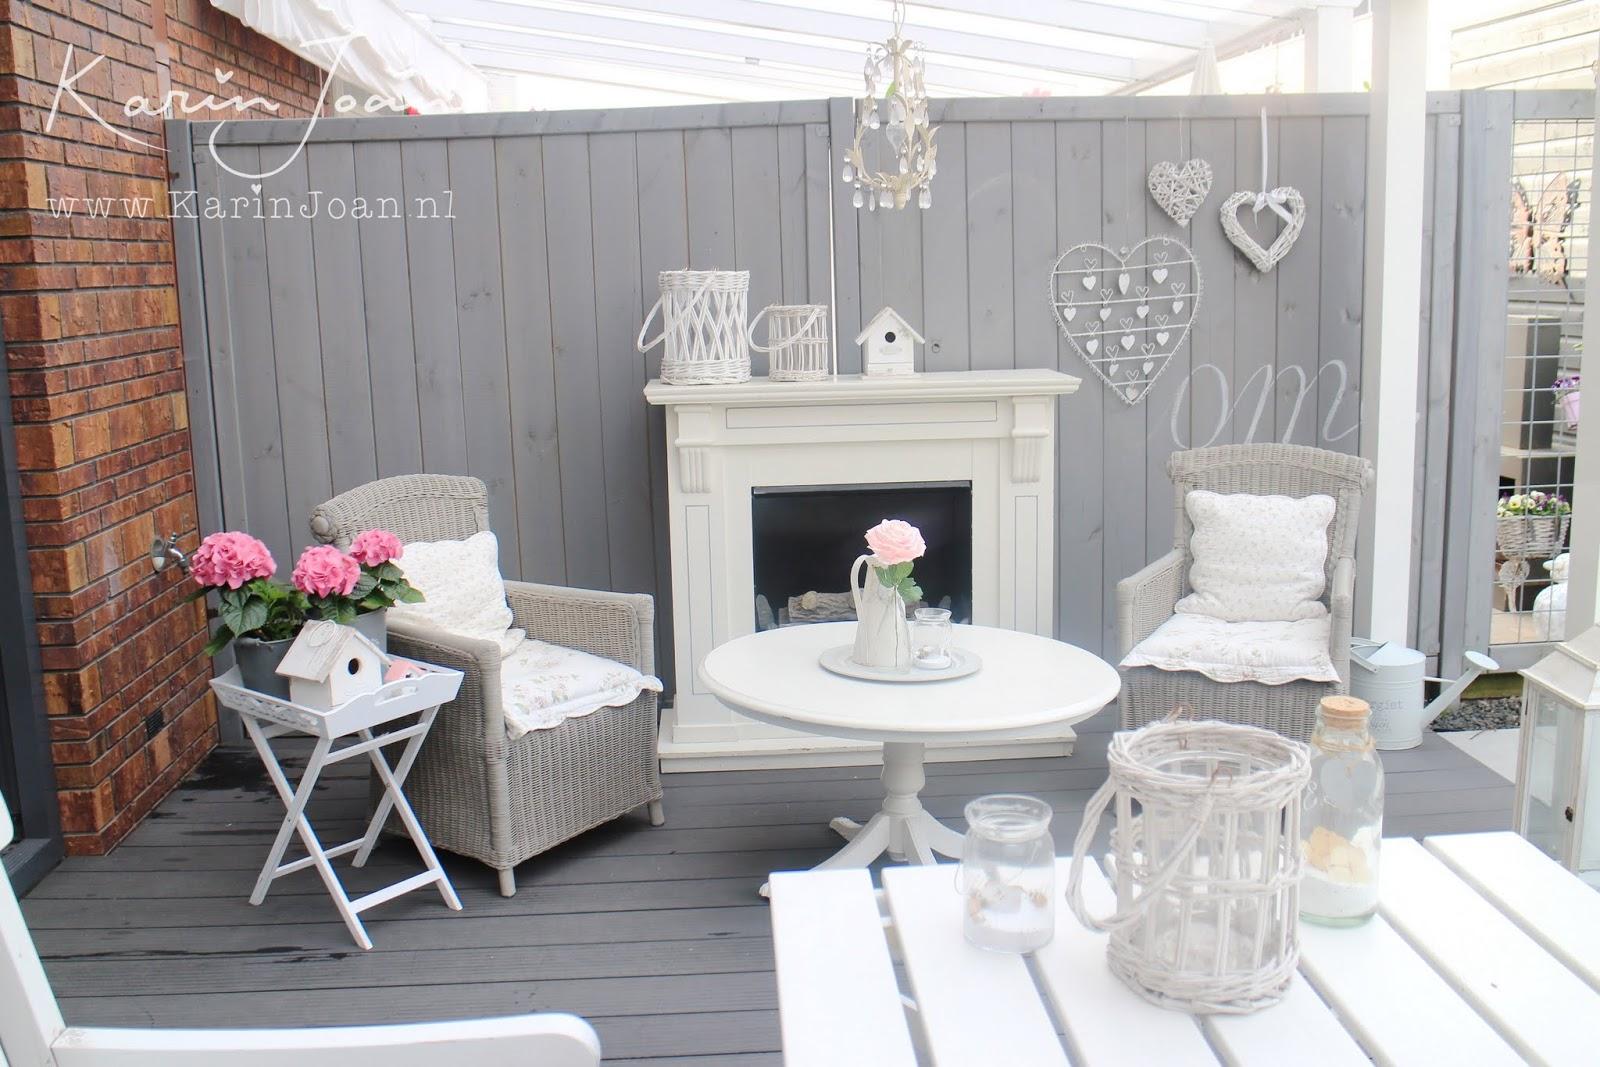 Karin joan rotan stoelen make over - Decoratie binnen veranda ...